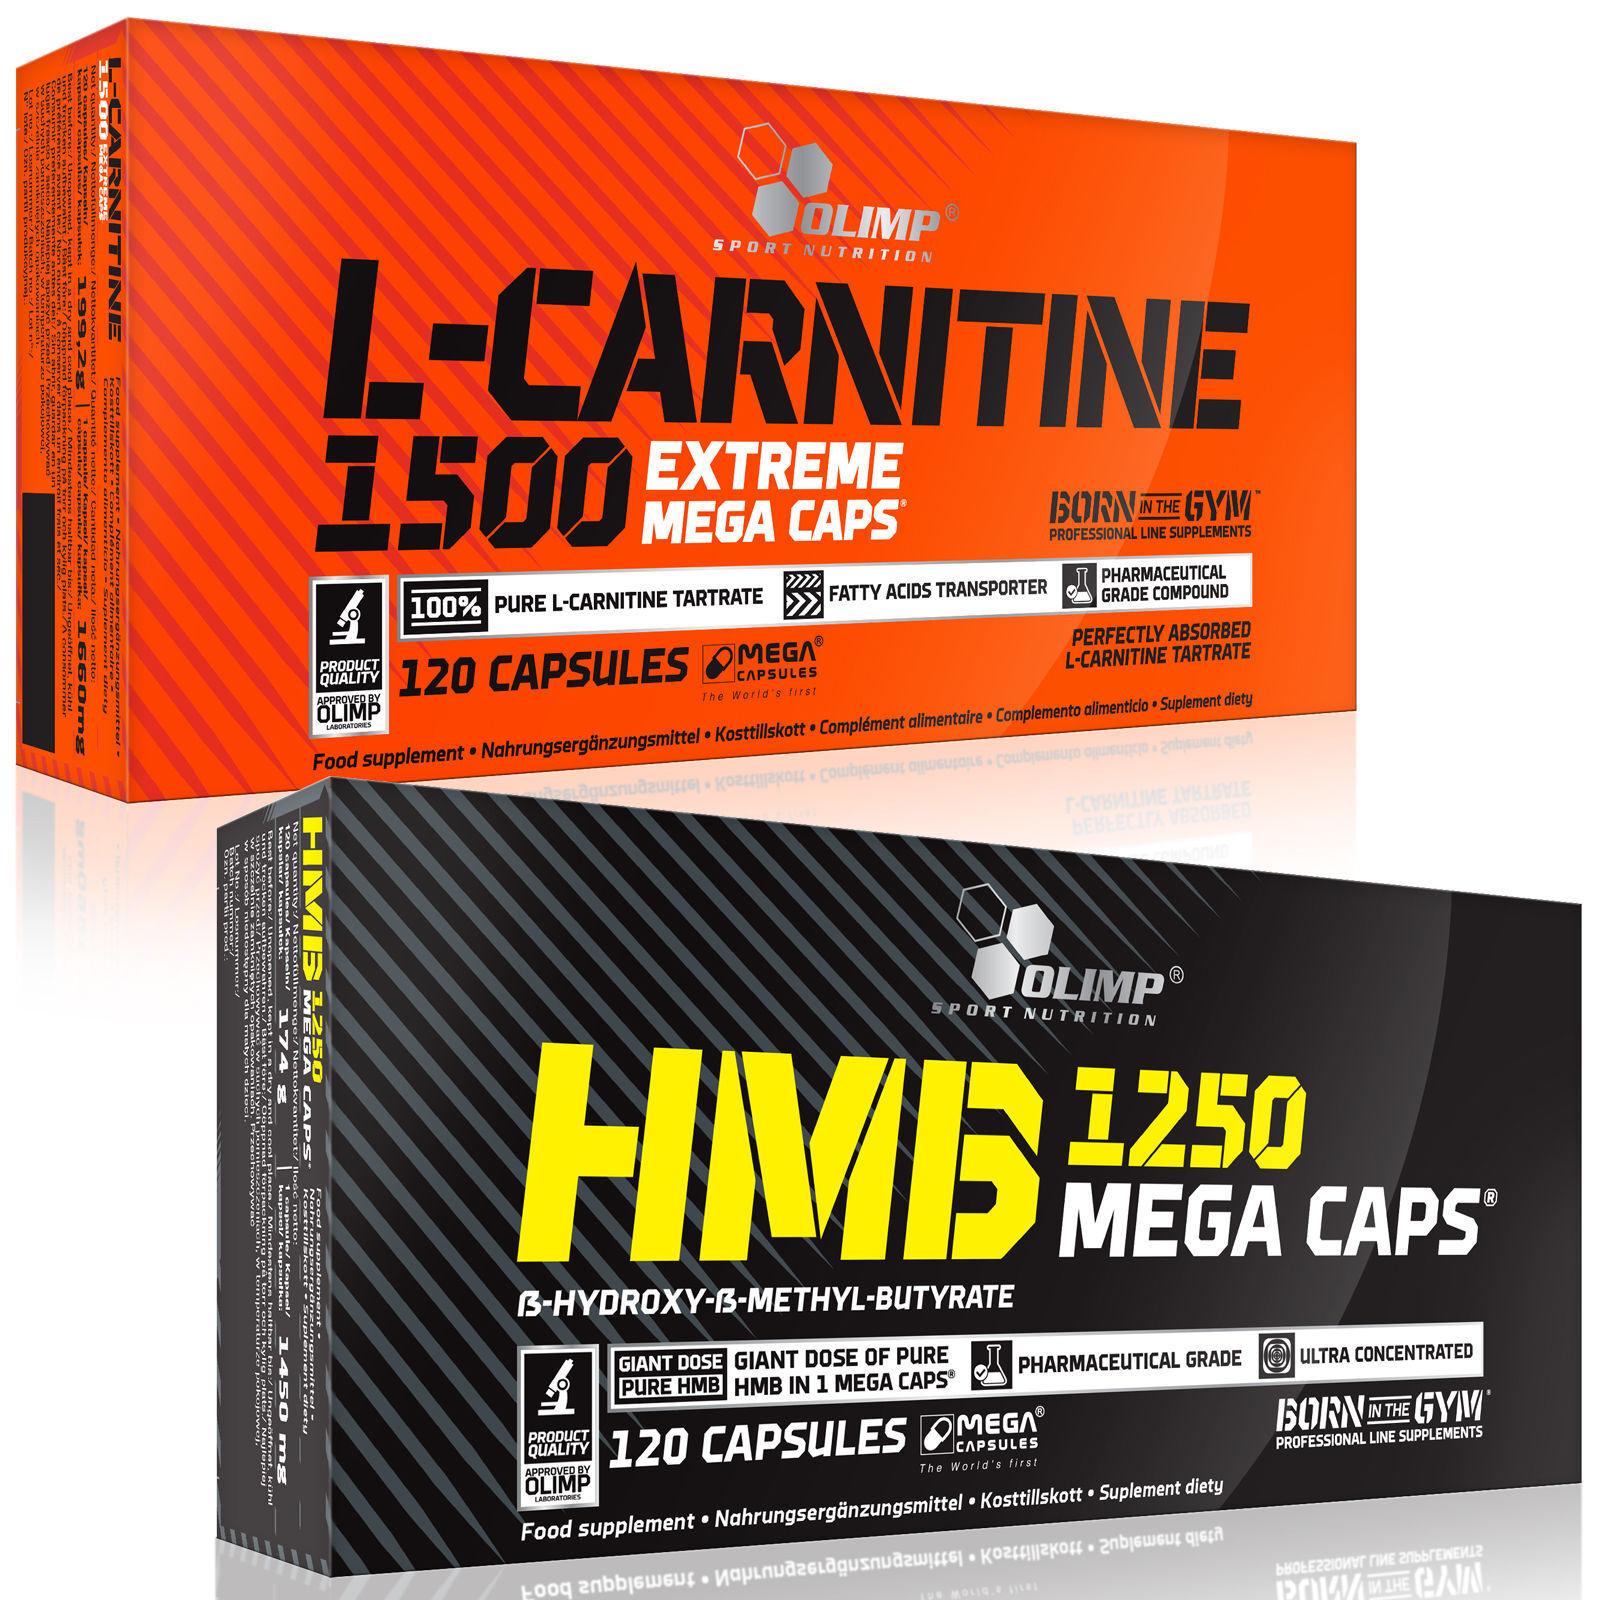 L-Carnitine + HMB 60-120 Capsules Non-Stimulant Fat Burner Weight Loss Slimming